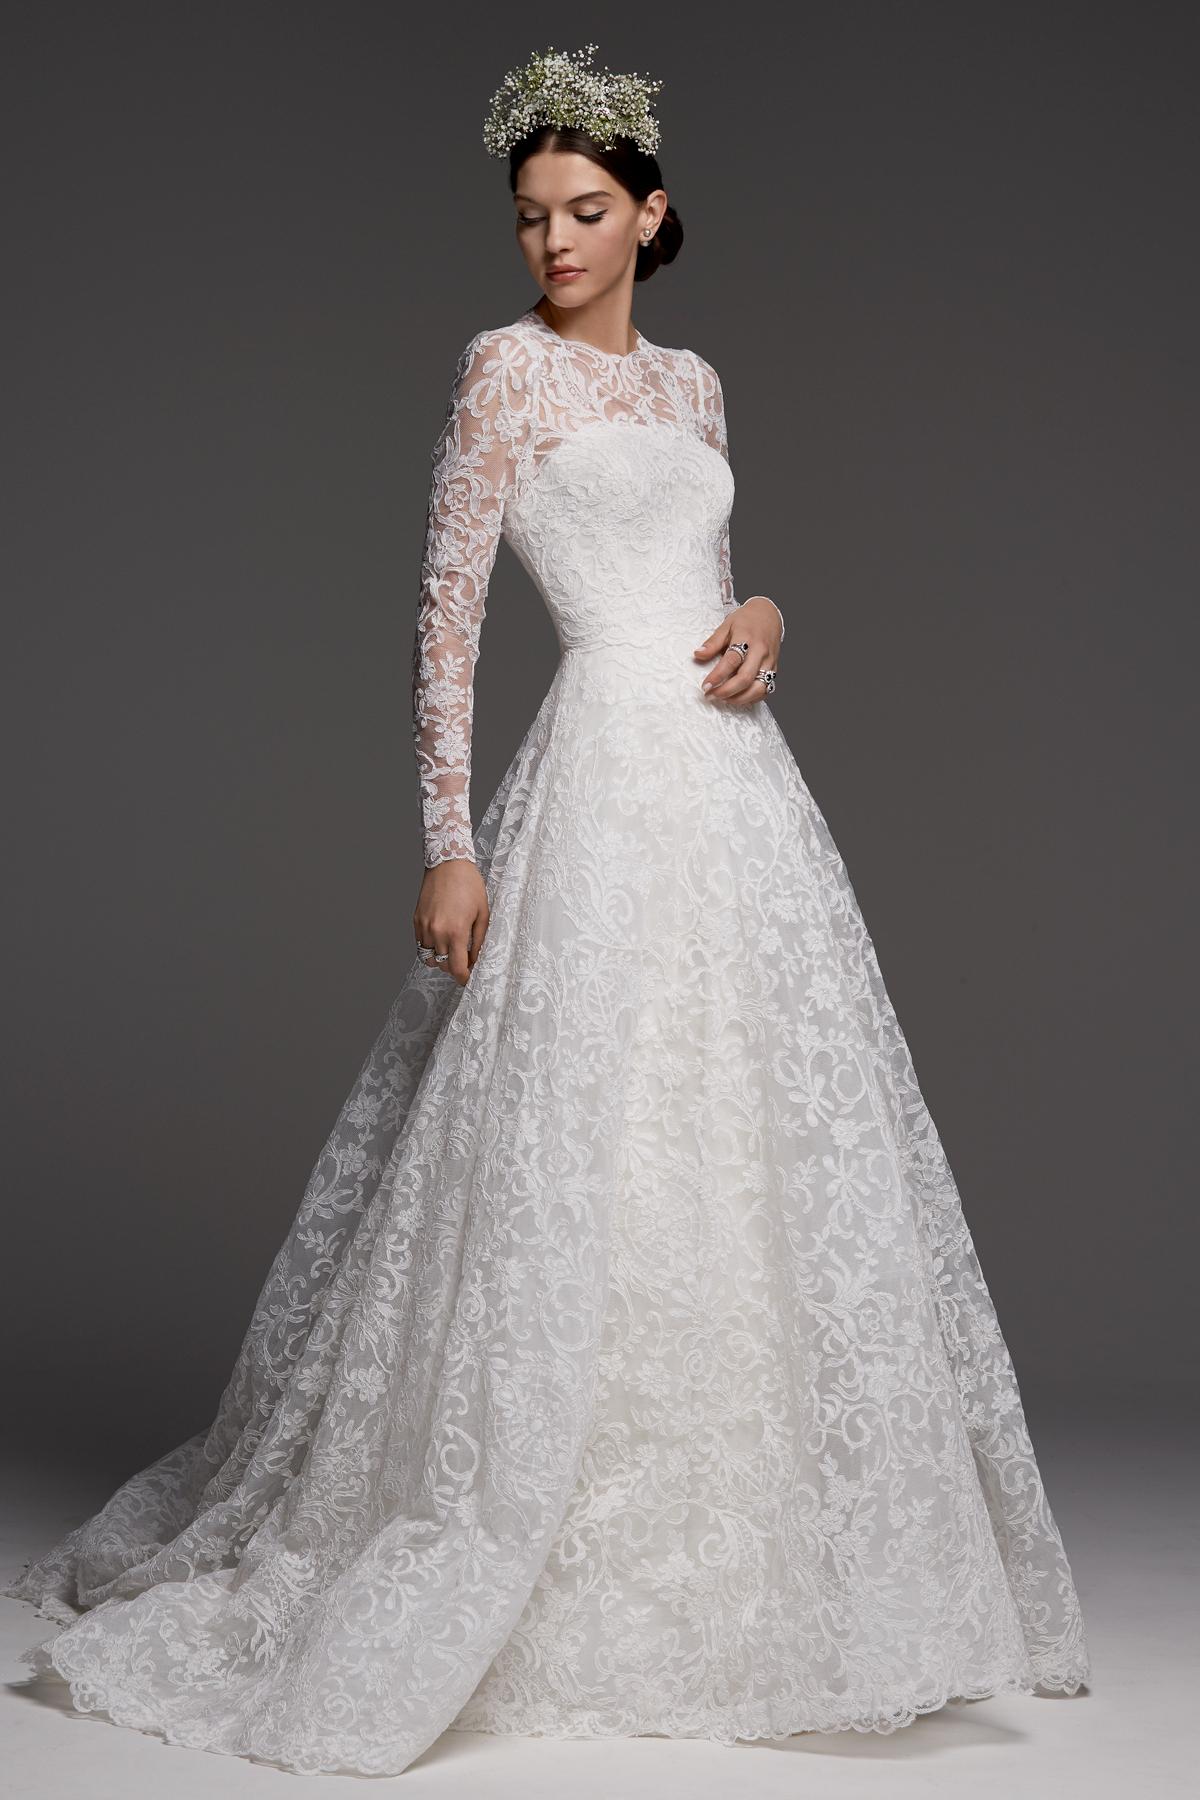 watters wedding dress fall 2018 a-line long sleeve lace